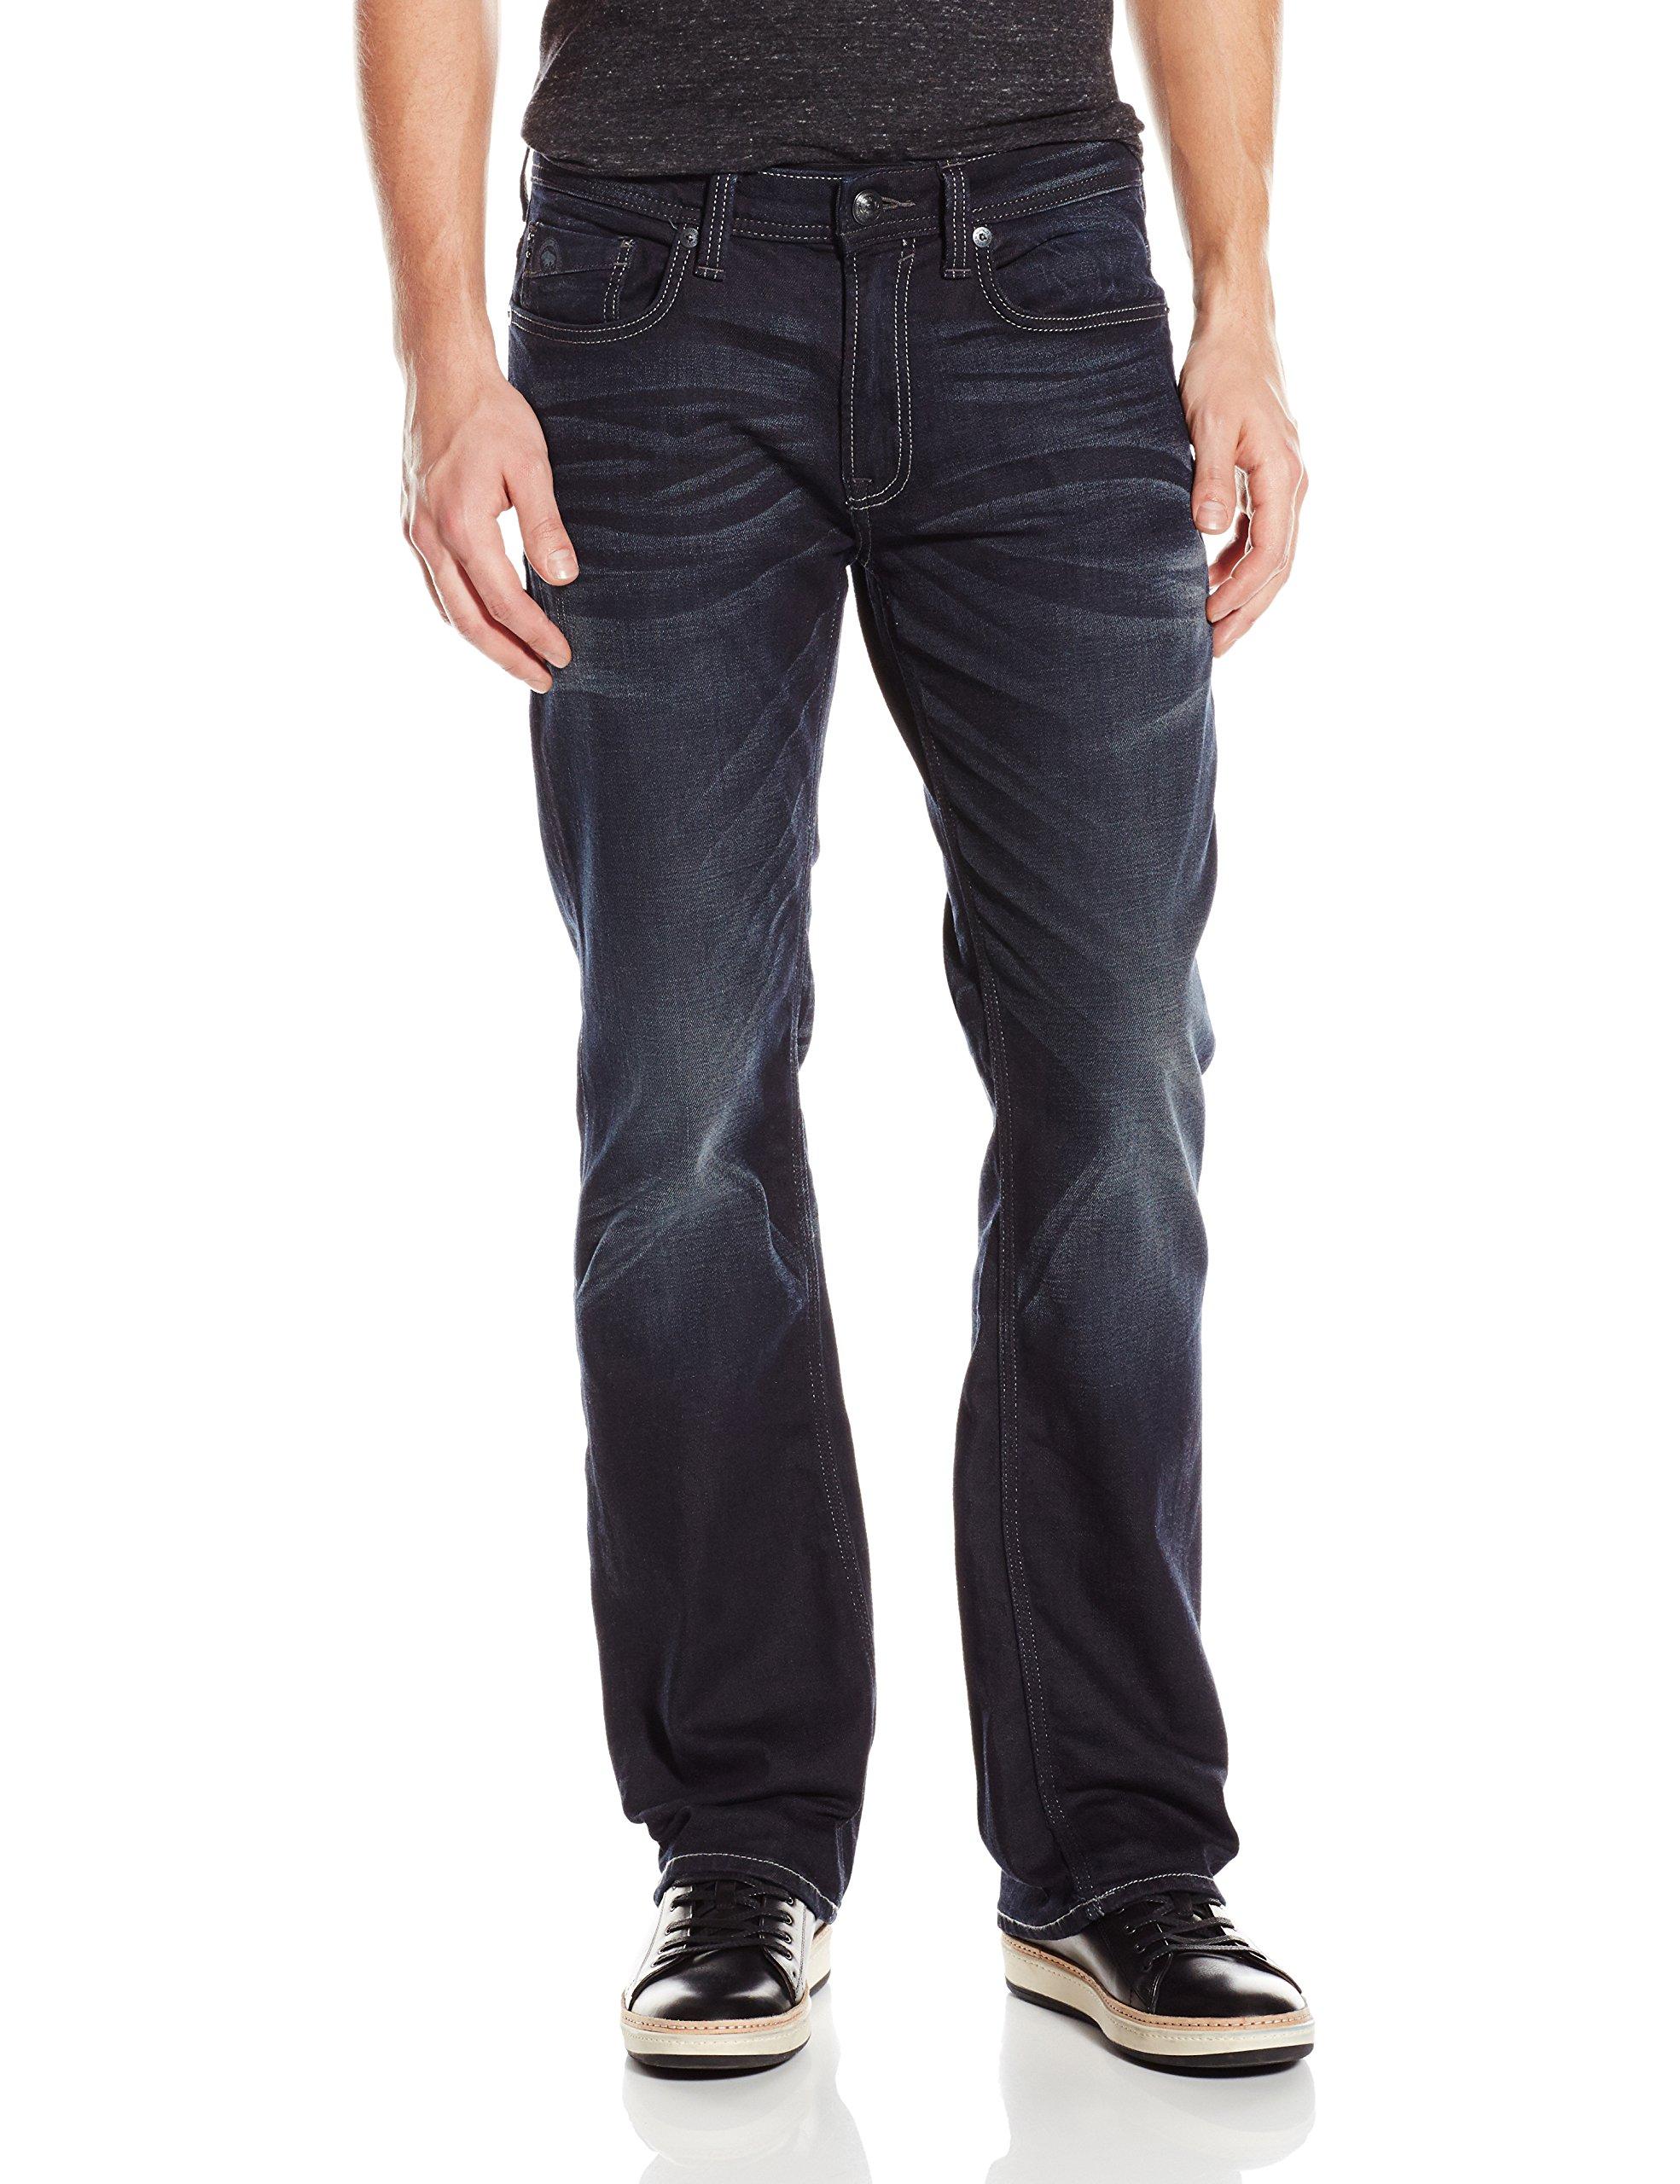 Buffalo David Bitton Men's King Slim Boot Cut Jean In Dark and Rigid, Dark/Rigid, 32 x 30